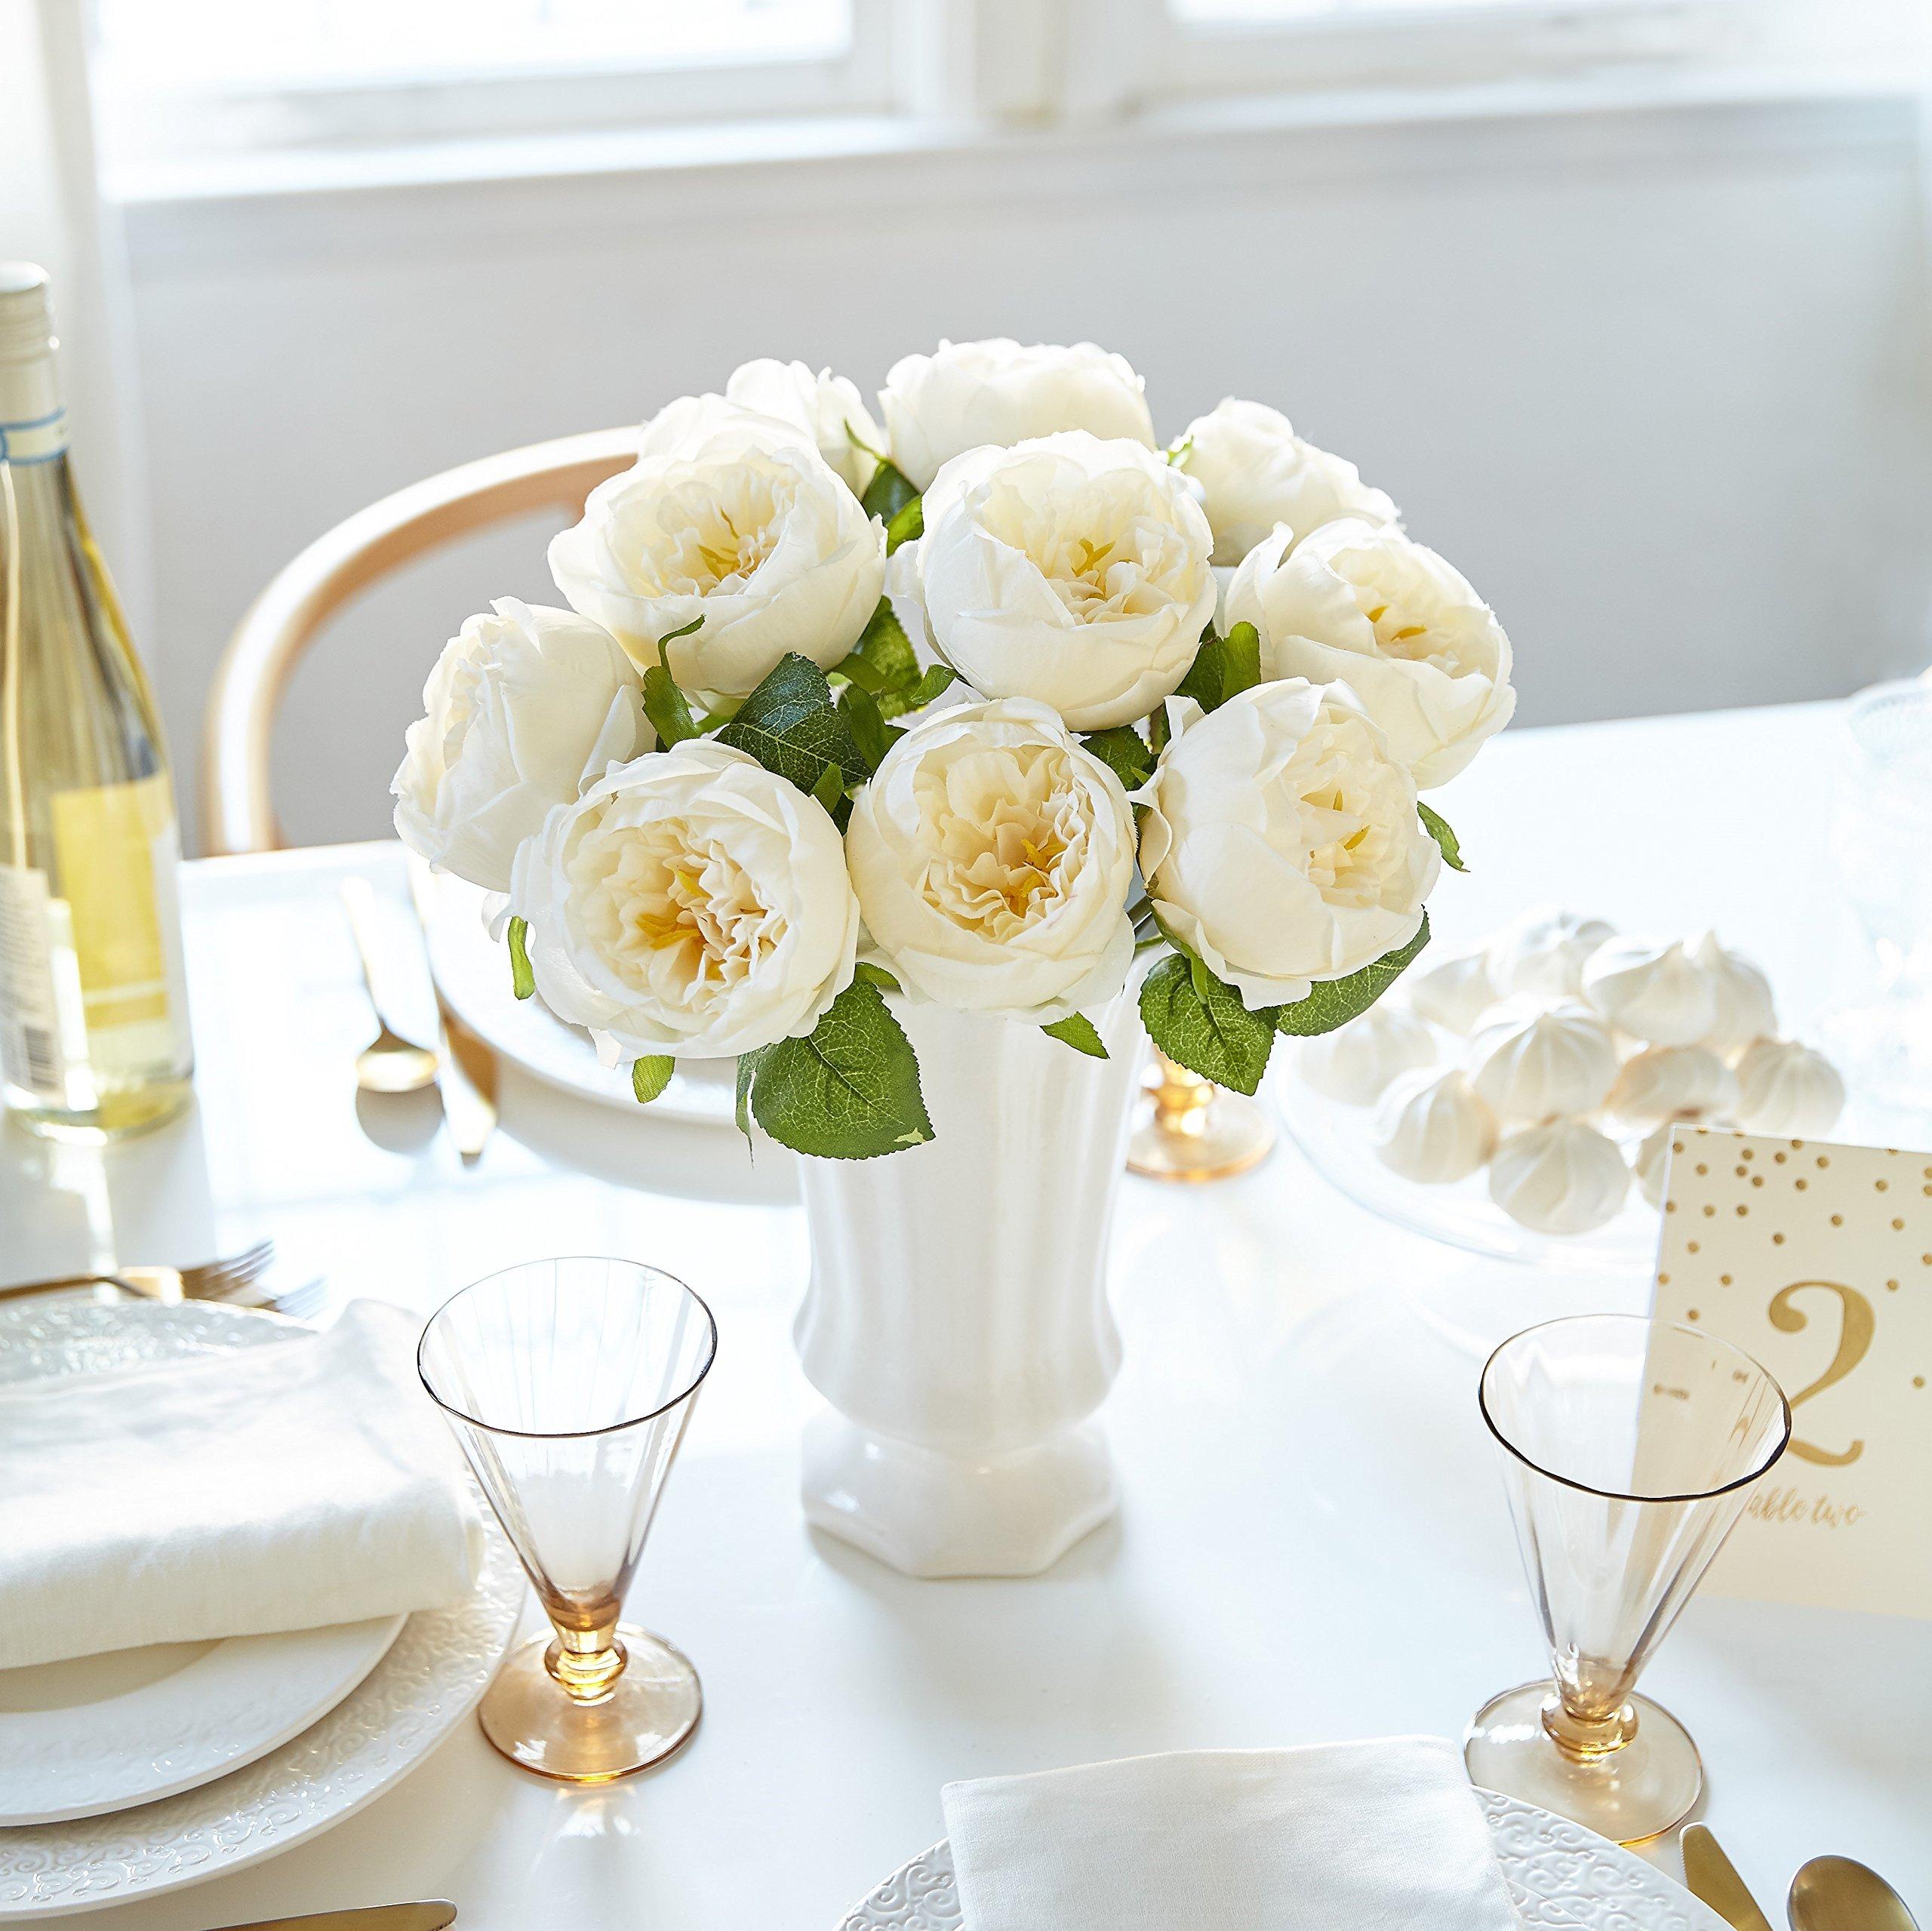 Artificial Peony Silk Flower Bouquet for Wedding Floral Arrangements and Home Decoration - Peach Color, 5 Stem Per Set